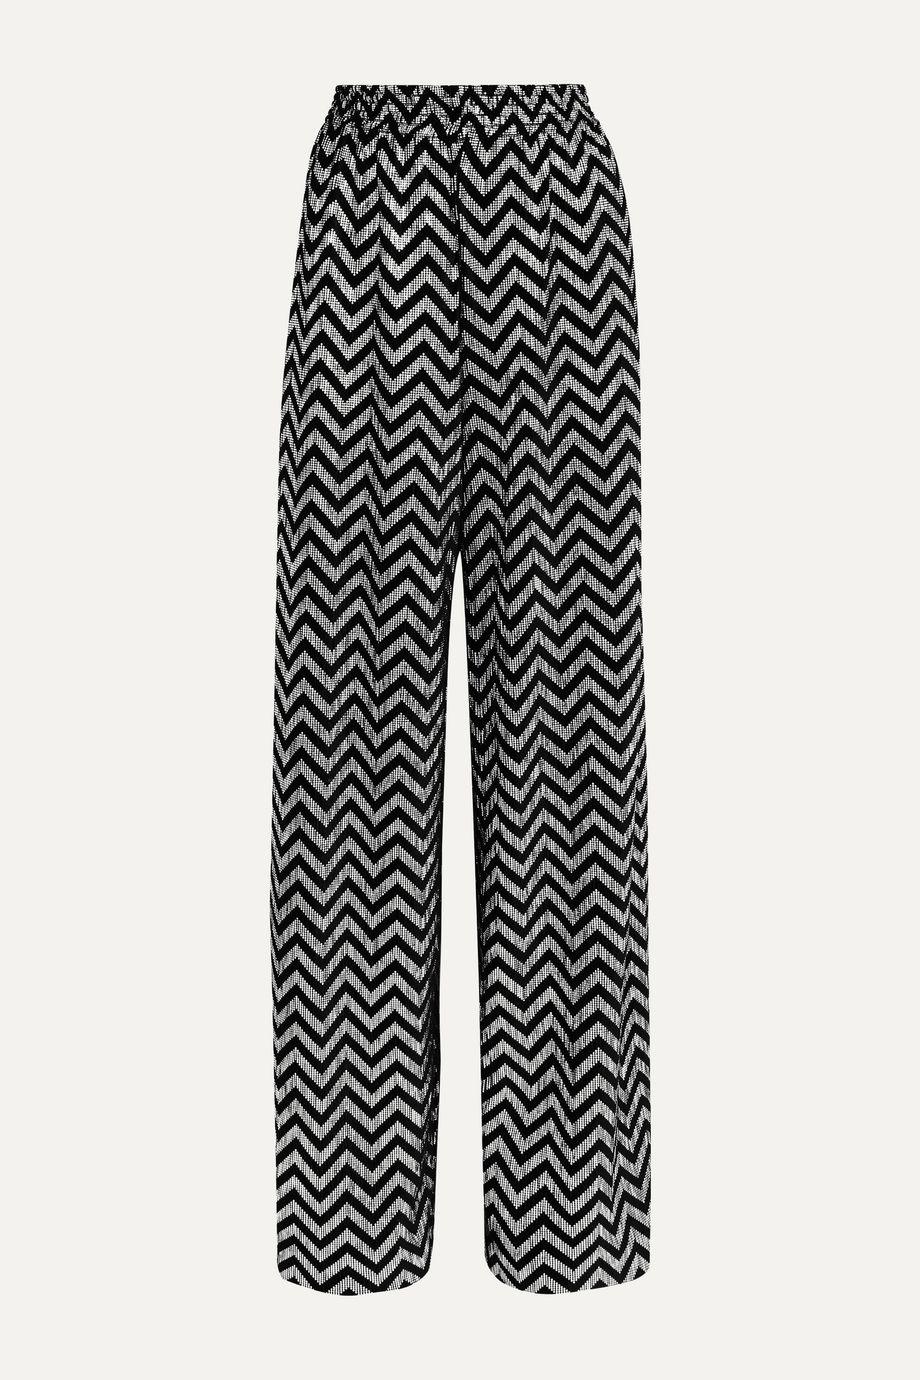 Alice + Olivia Pantalon large en velours plissé métallisé imprimé Elba